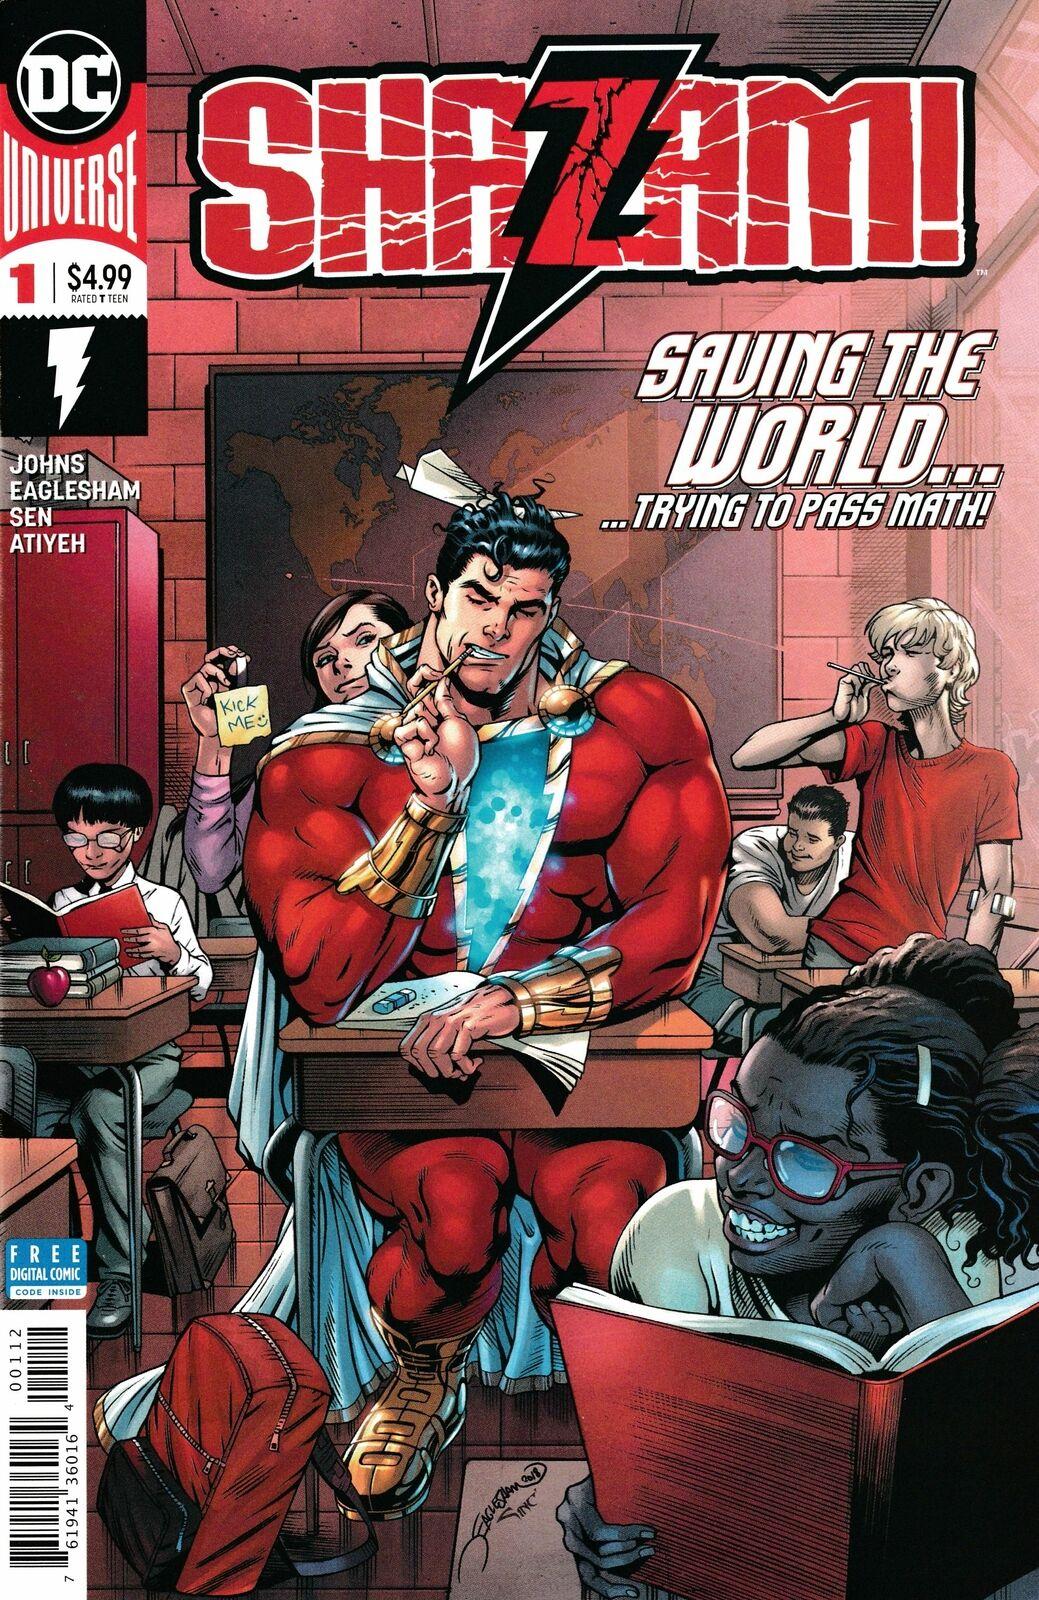 DC COMICS FLASH #66 MAY 2019 1ST PRINT NM